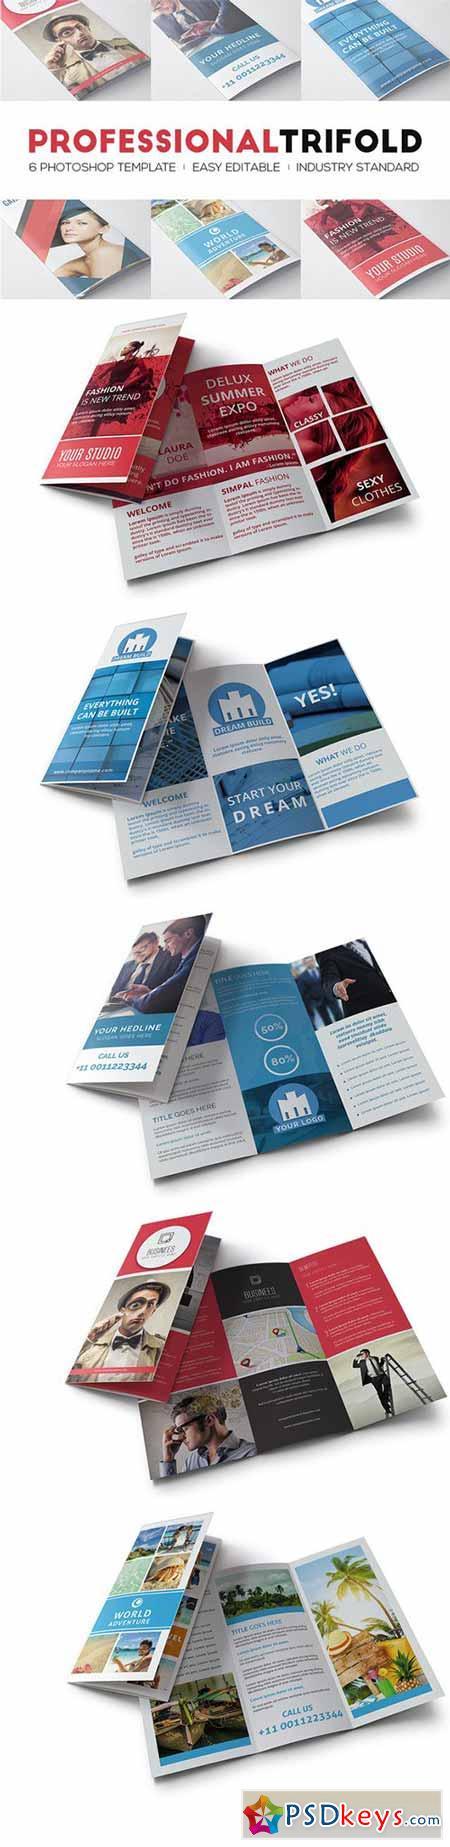 Professional Trifolds Bundle 379874